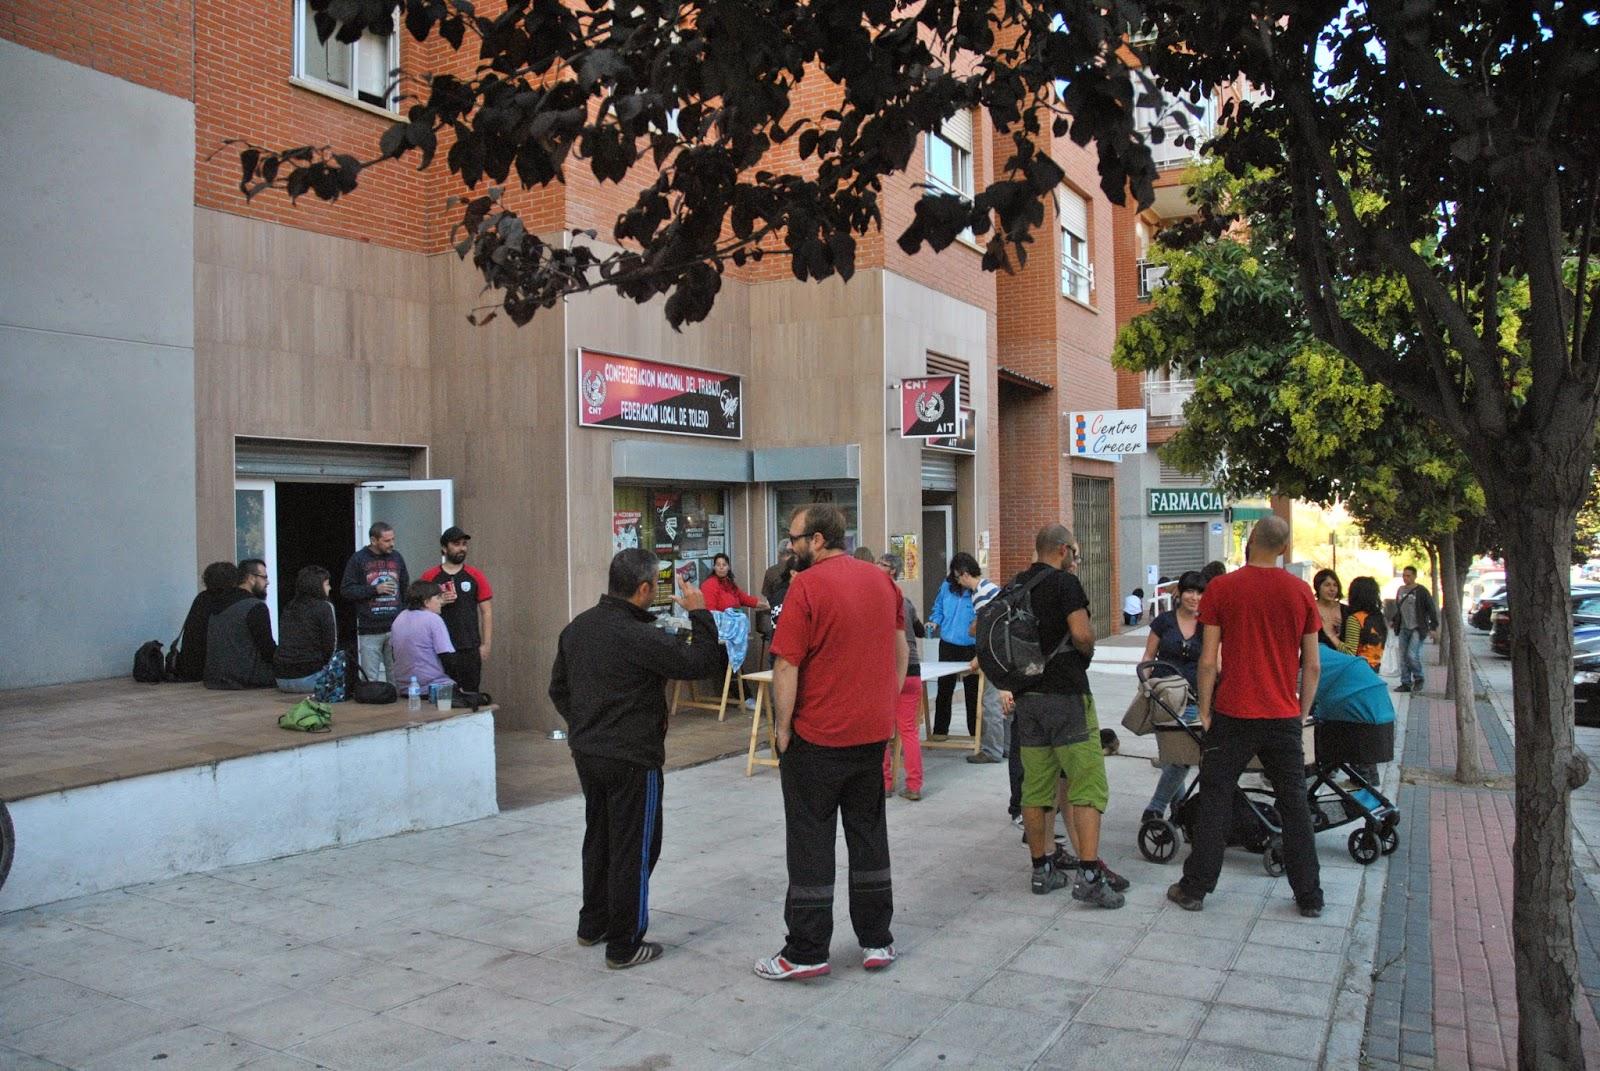 http://cntaittoledo.blogspot.com.es/2014/11/cronica-de-las-jornadas-de-inauguracion.html